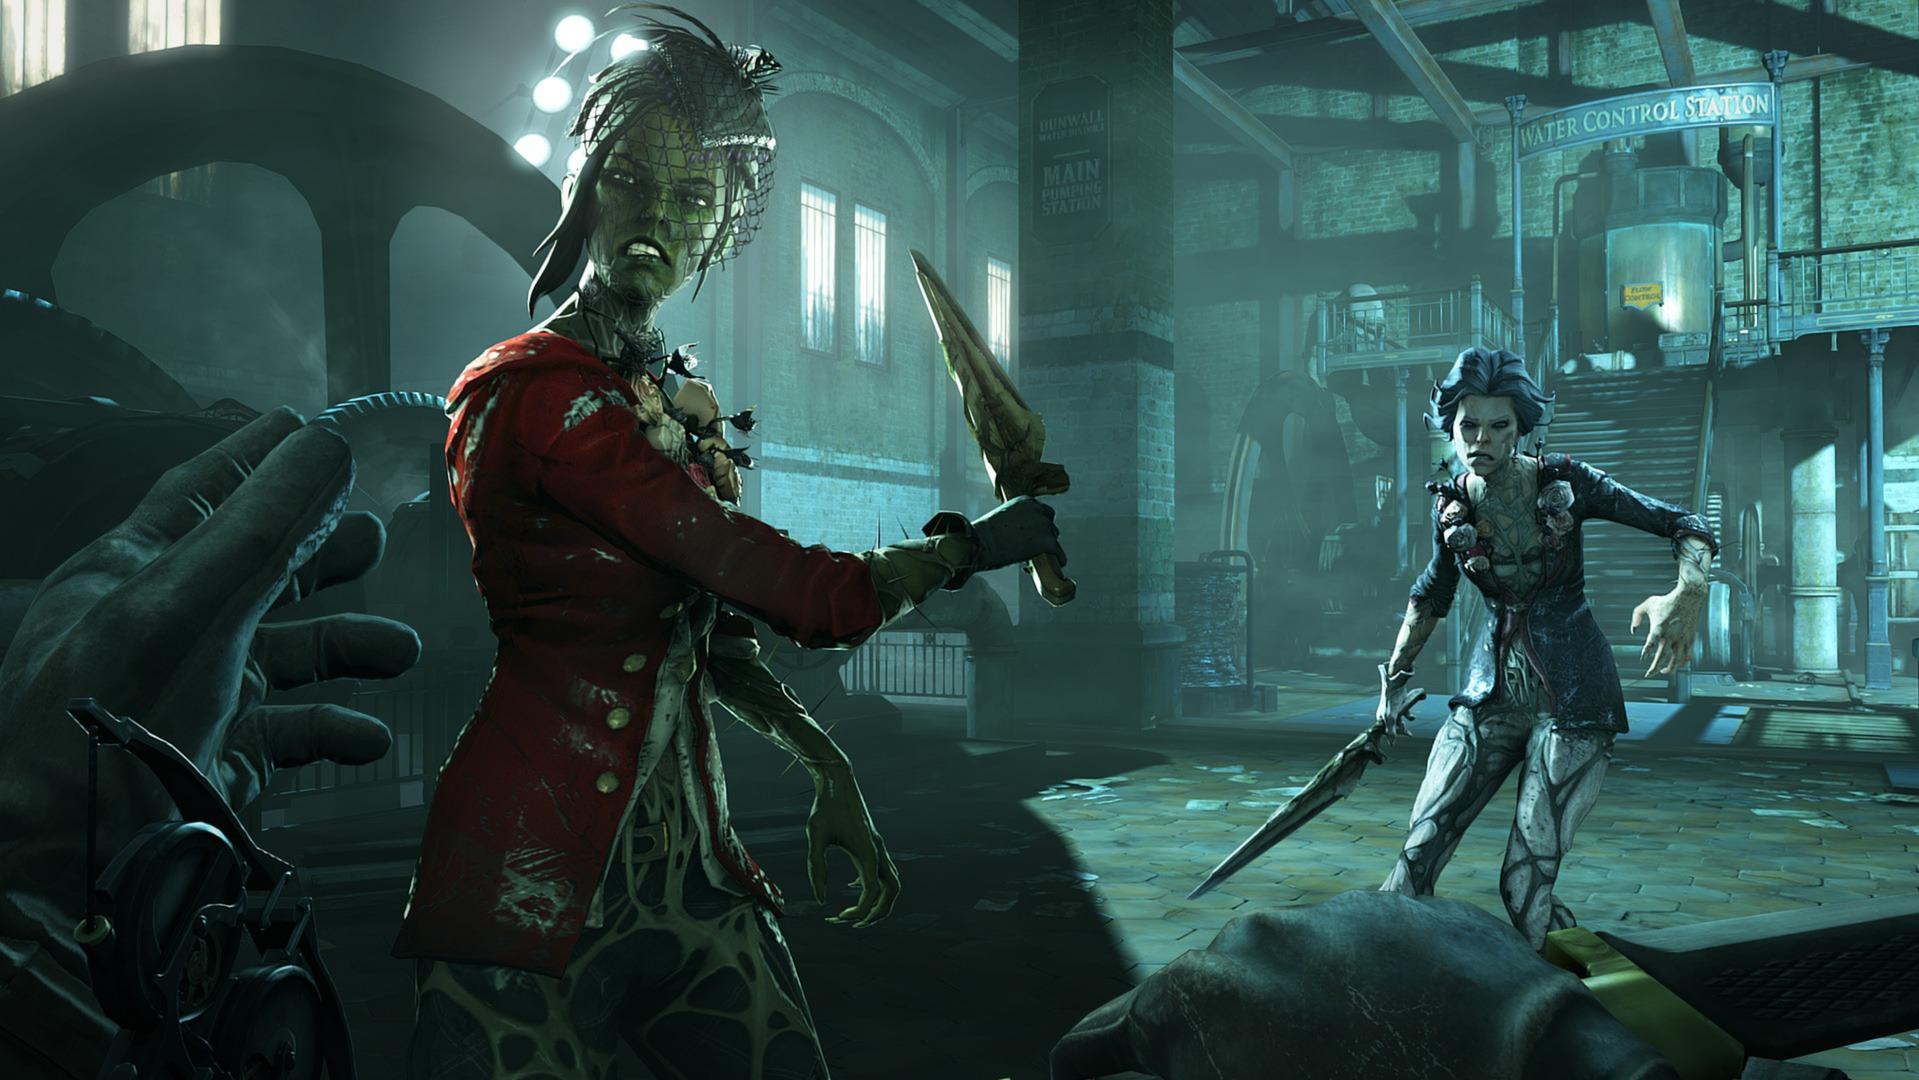 dishonored-definitive-edition-pc-screenshot-3